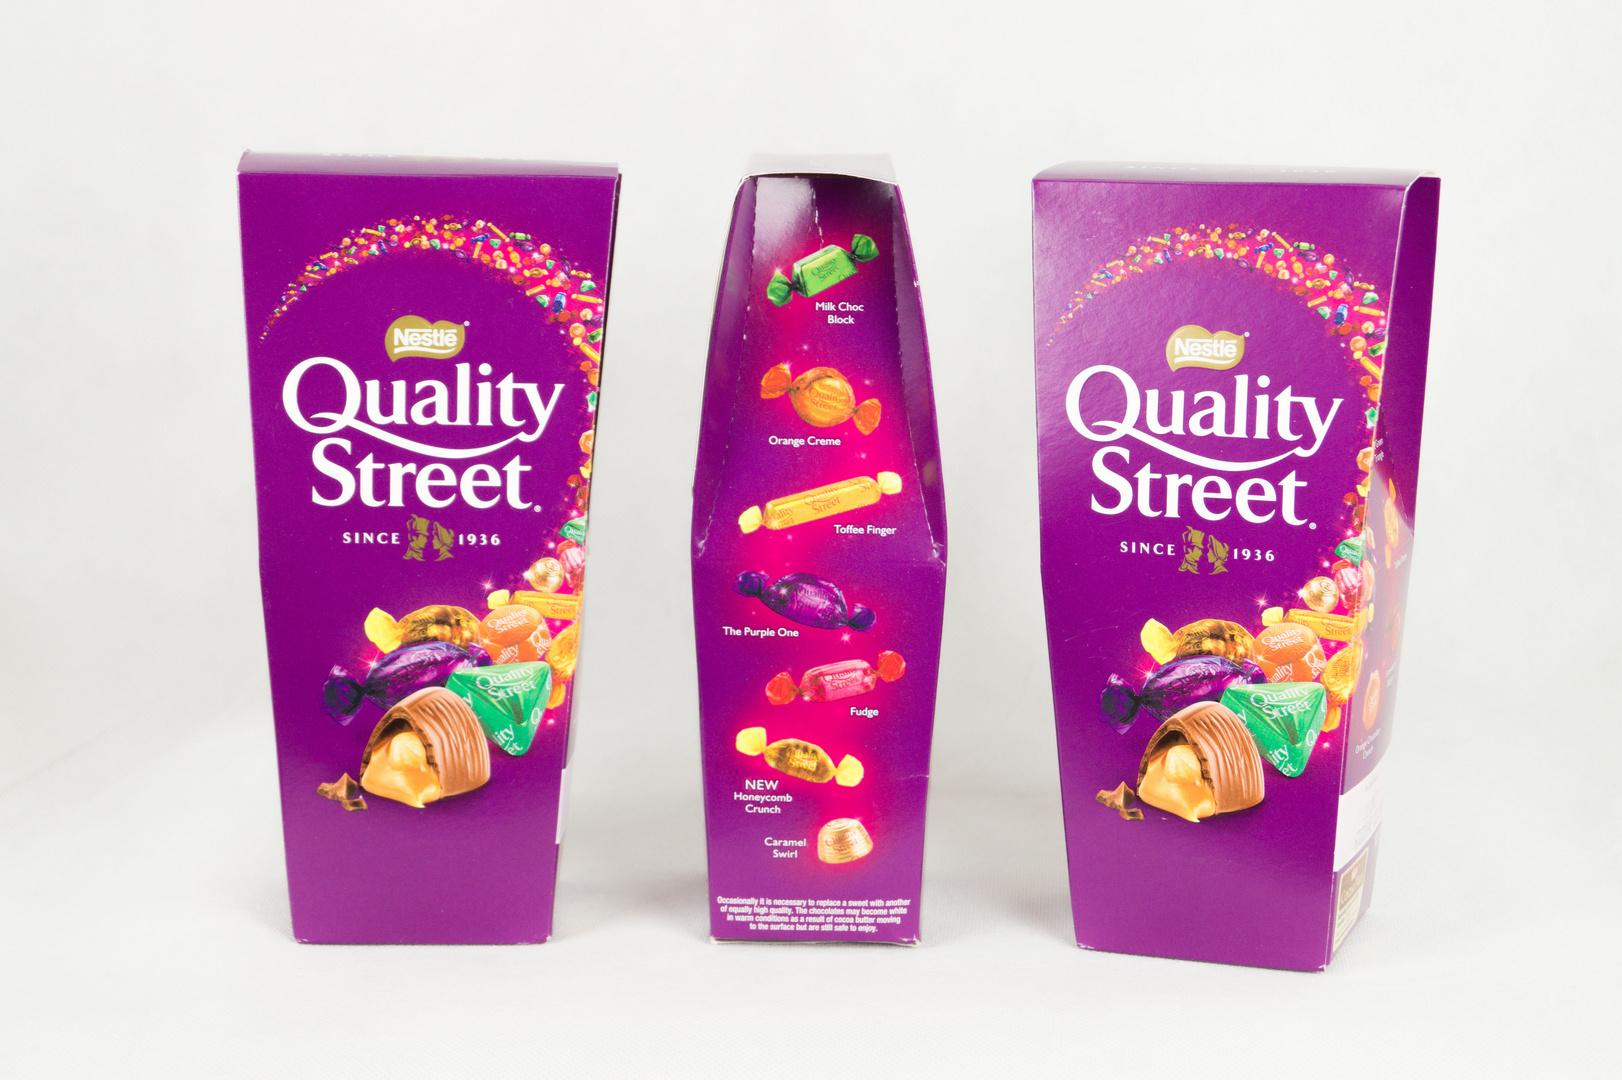 Nestlé Produktfotografie